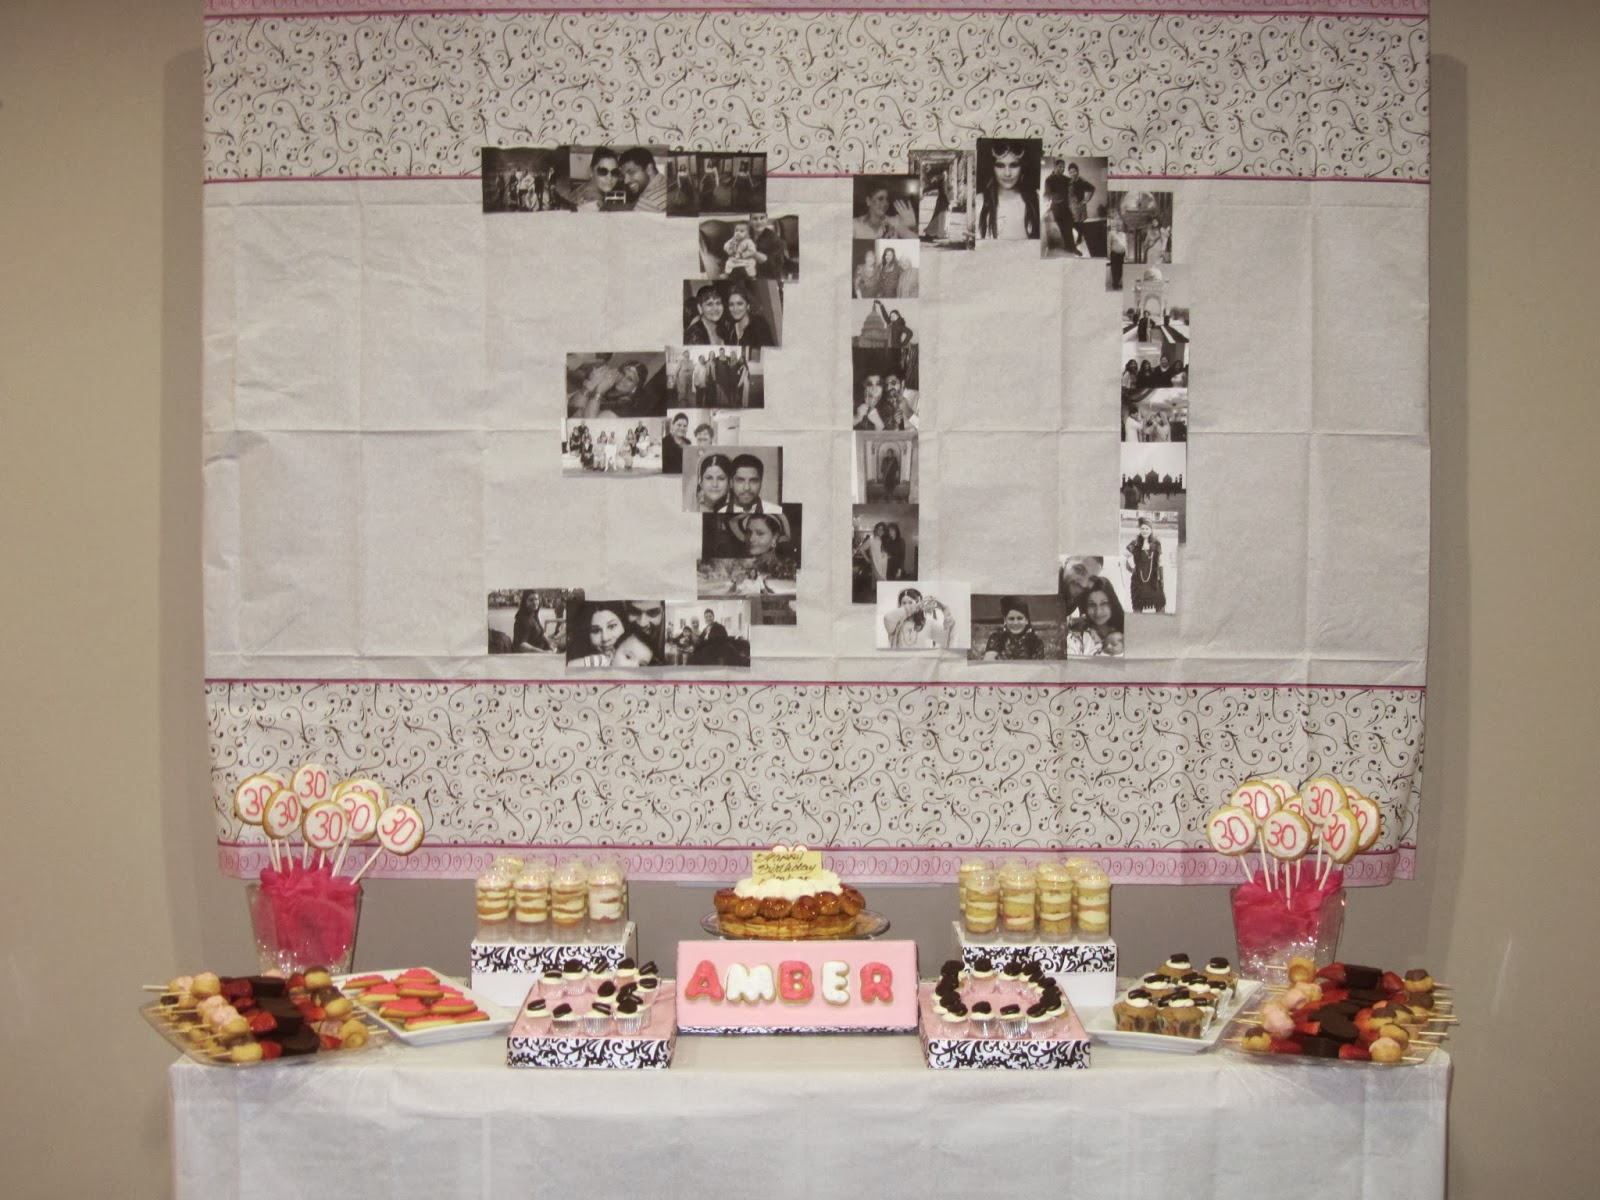 b29c0add6 30th Birthday Dessert Display - A Day In The Lalz